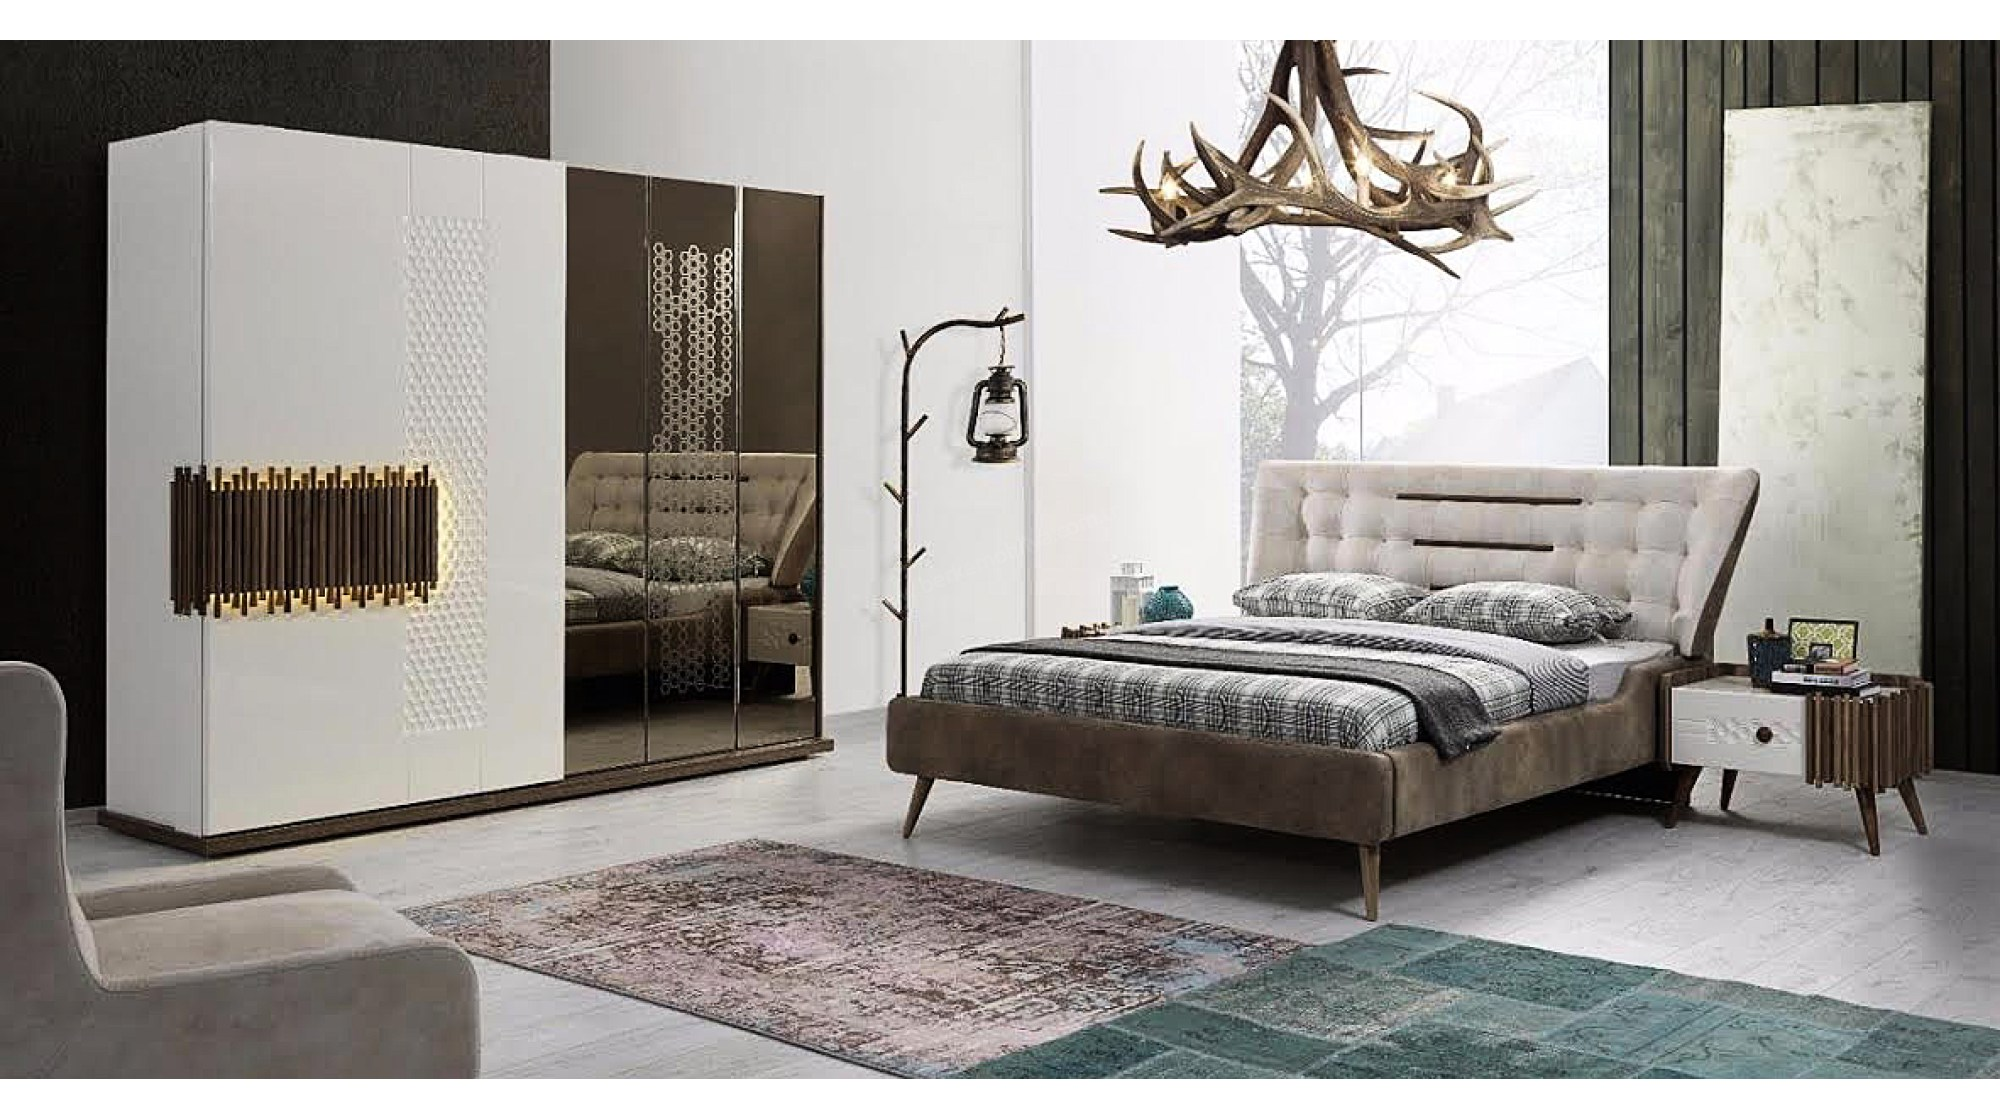 بالصور غرف نوم جديده , احدث غرف النوم 2019 4042 4